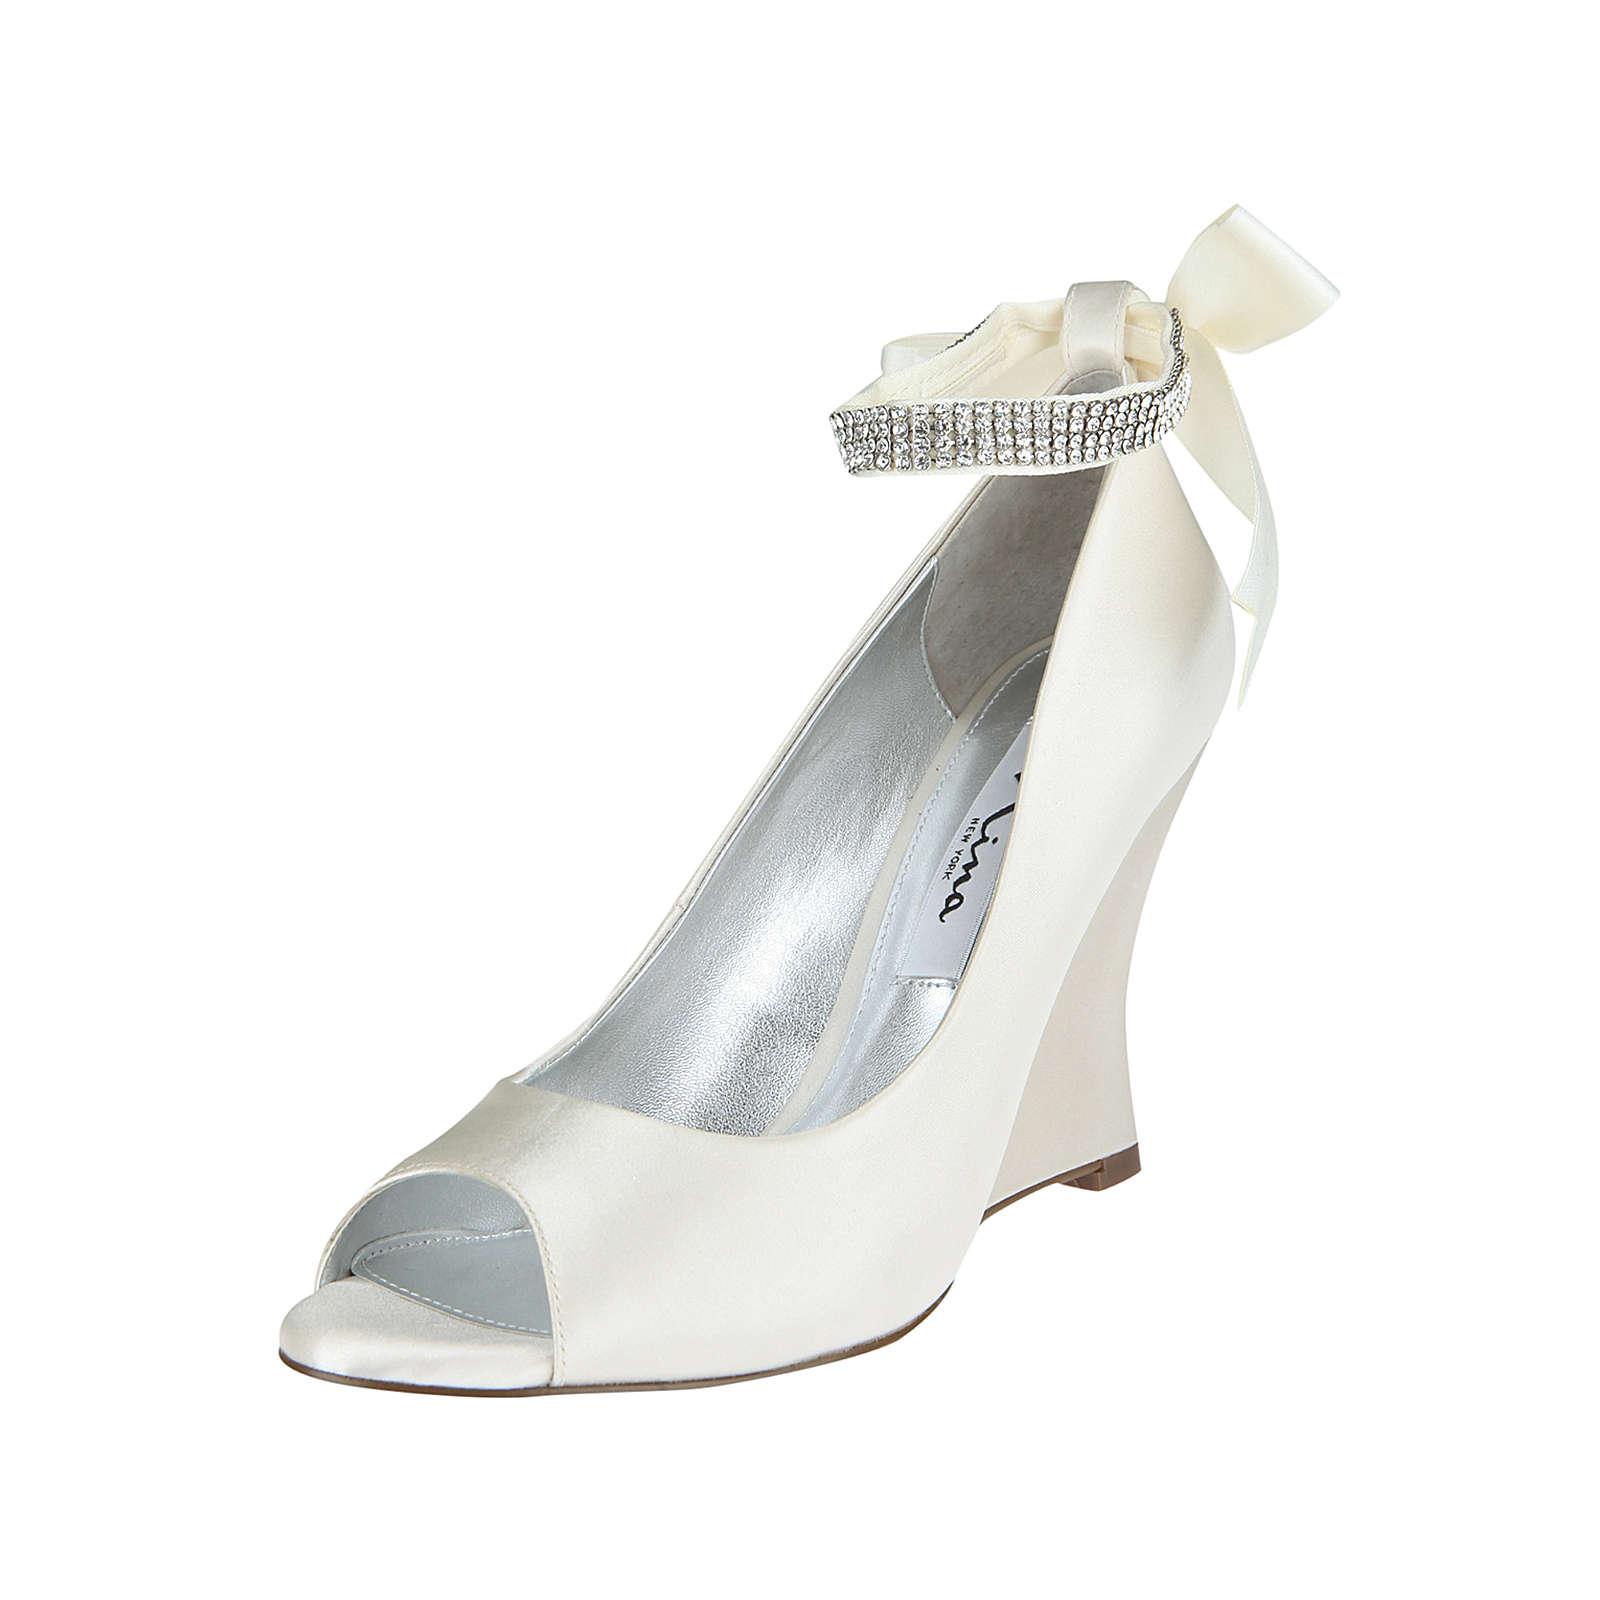 c796d8c2cb6263 Nina Shoes Keilpumps EMMA Keilpumps creme Damen · Tamaris ...